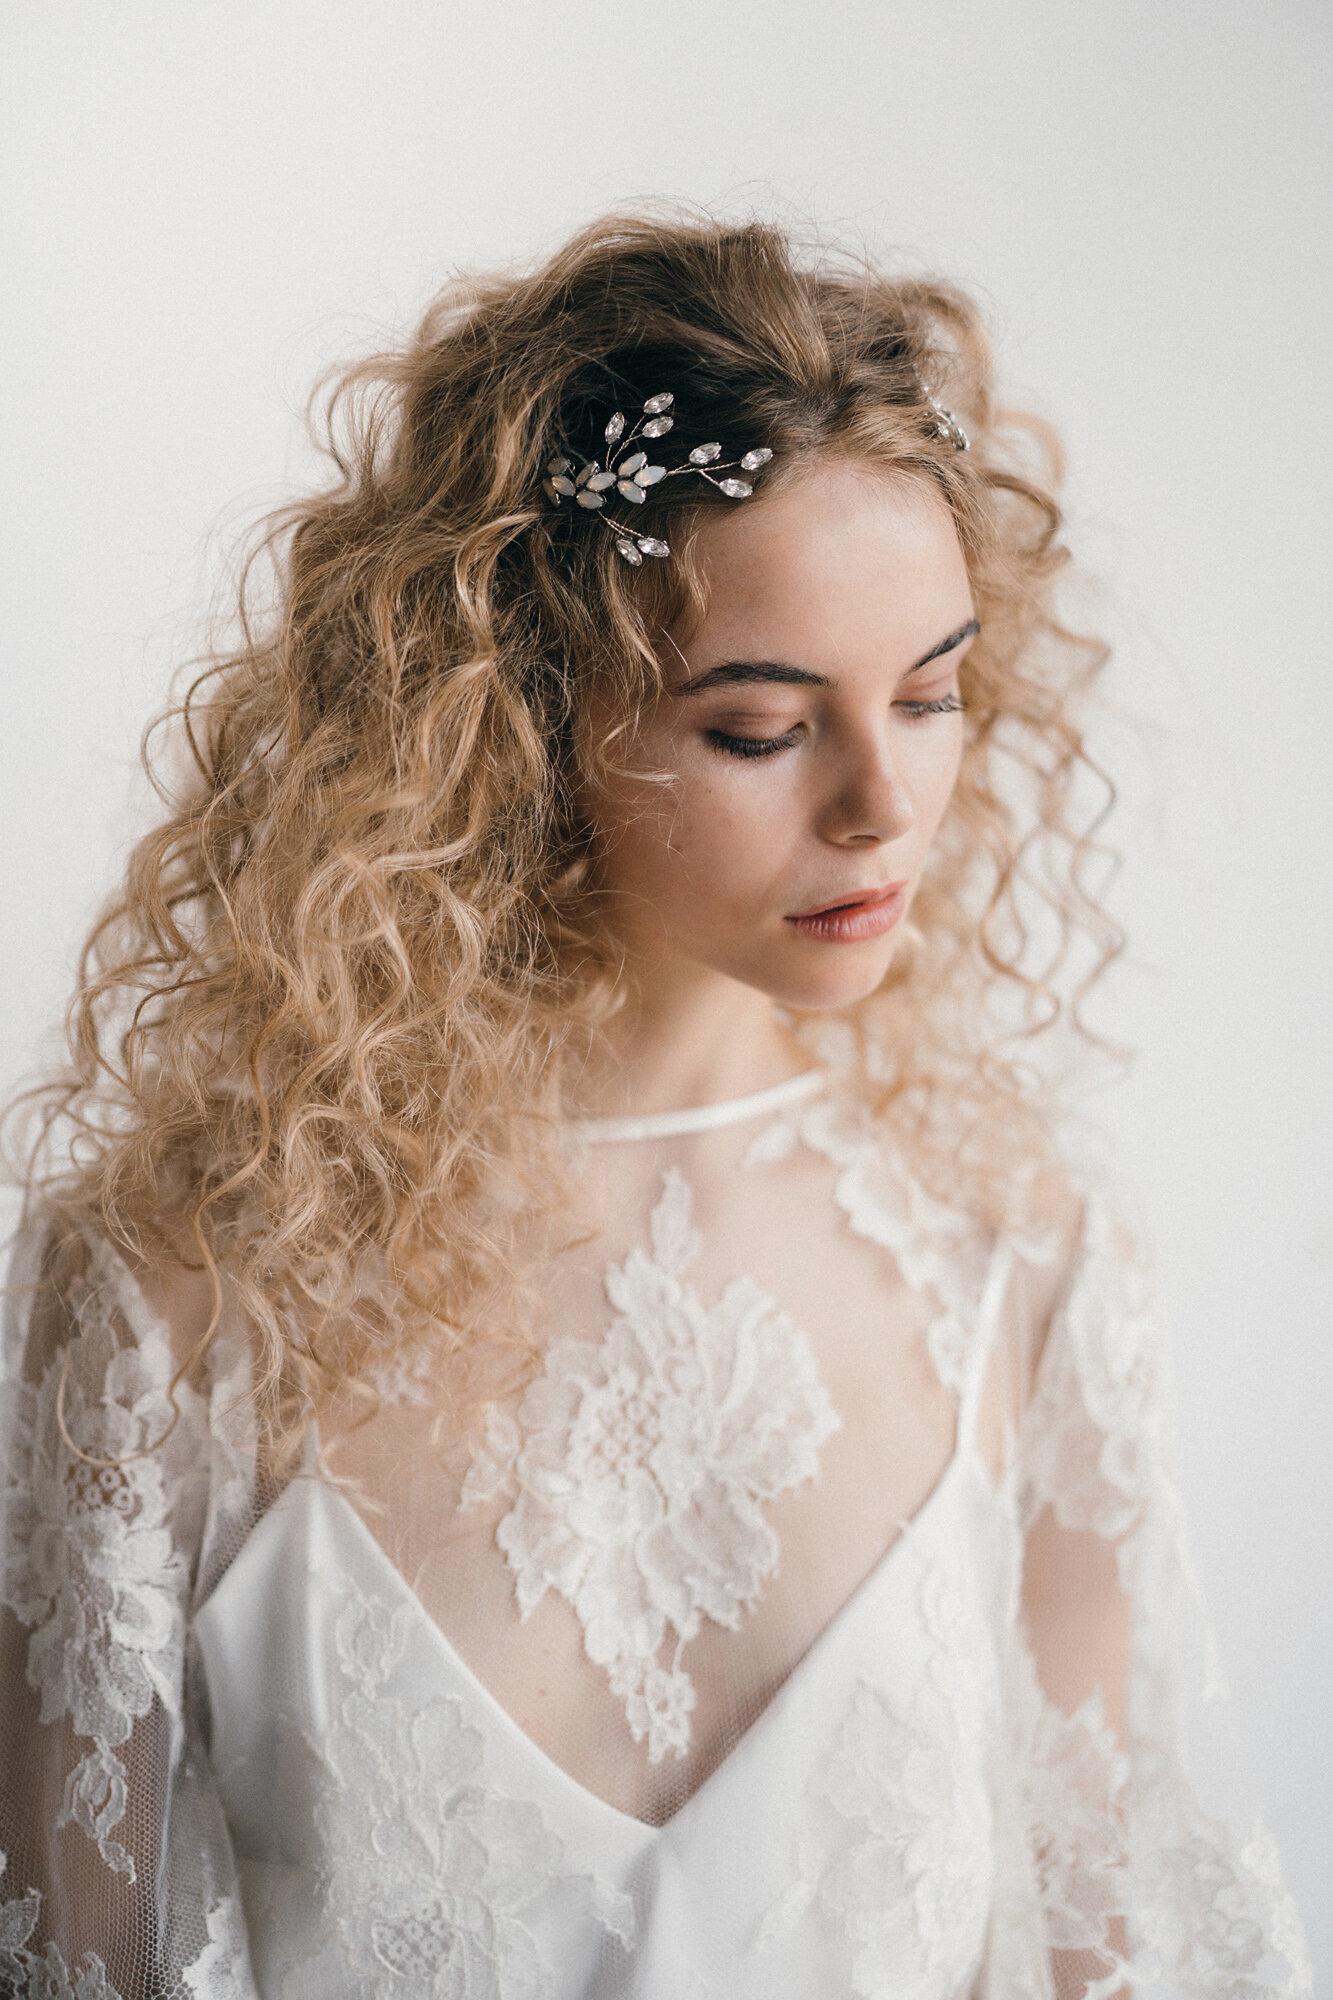 Debbie-Carlisle-Bridal-Accessories-Kate-Beaumont-Wedding-Gowns-Sheffield-Yorkshire-UK-38.jpg